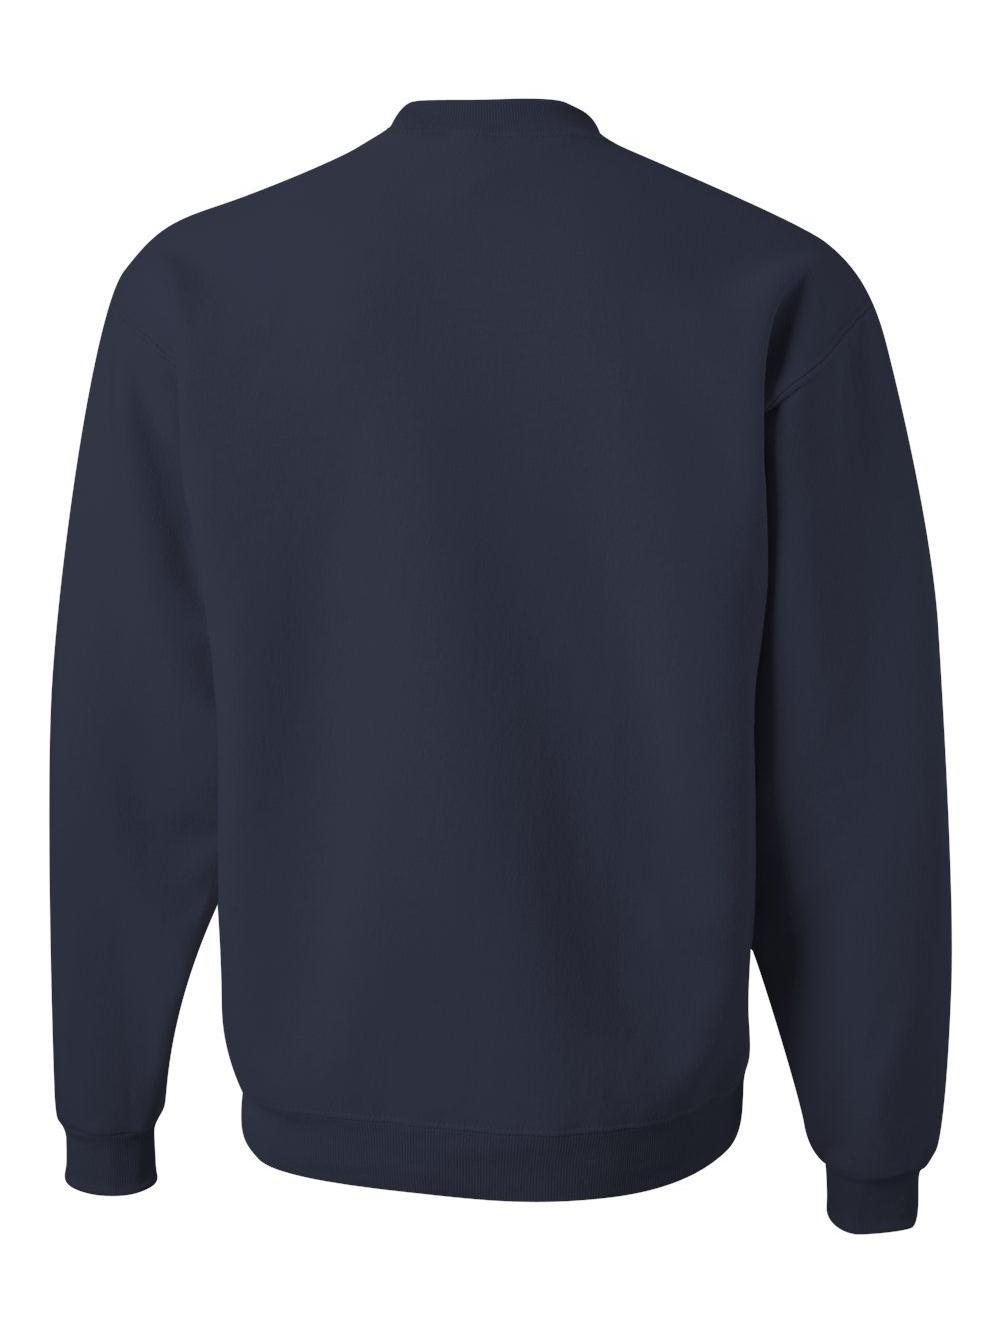 Jerzees-NuBlend-Crewneck-Sweatshirt-562MR thumbnail 46